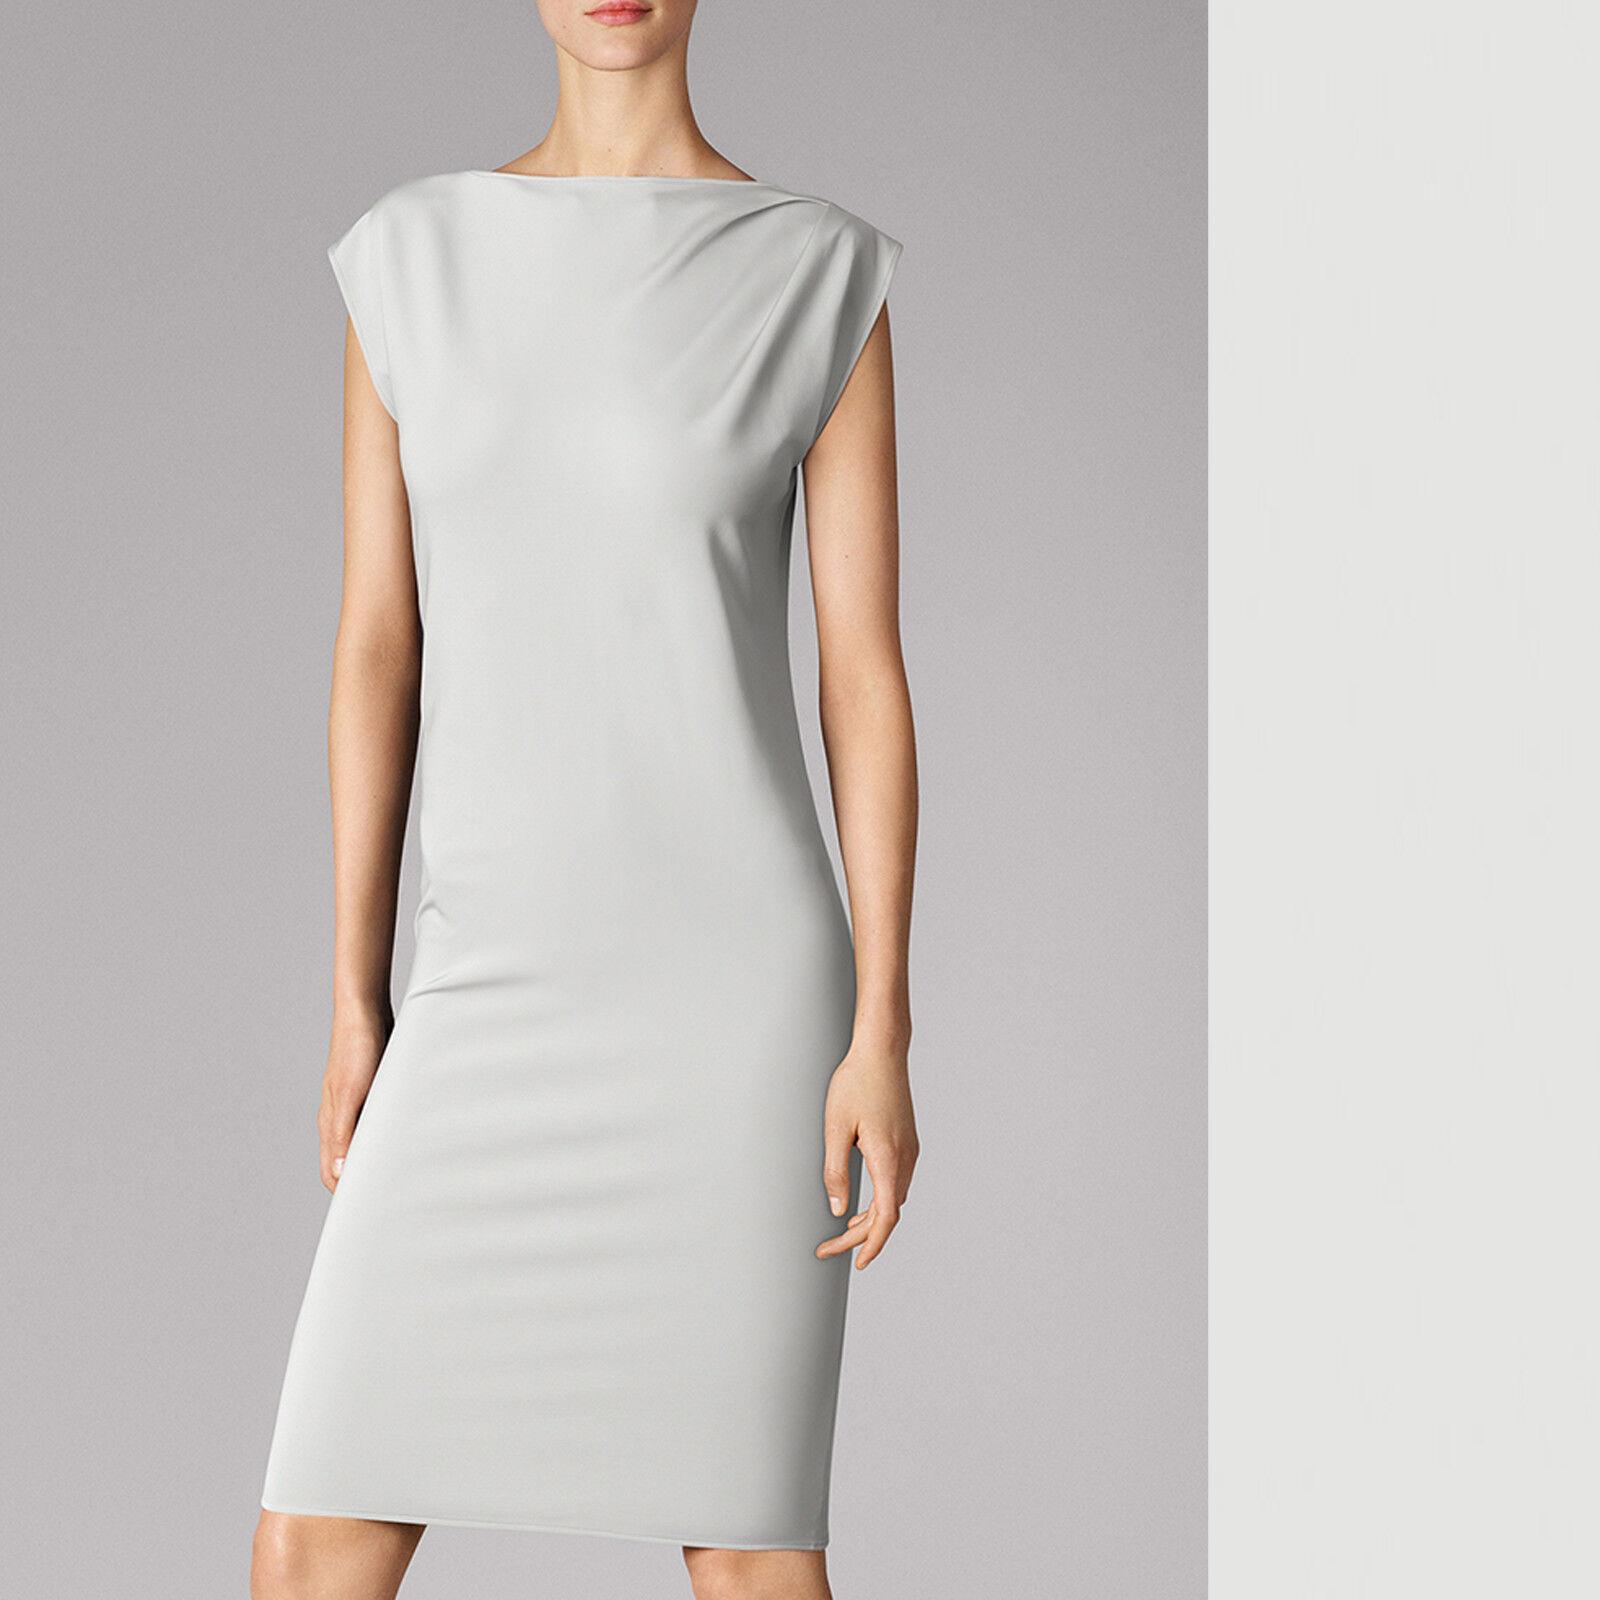 Wolford Kim Dress - EU 38 - dust   ...  Kleid aus feiner matter Viskosejersey